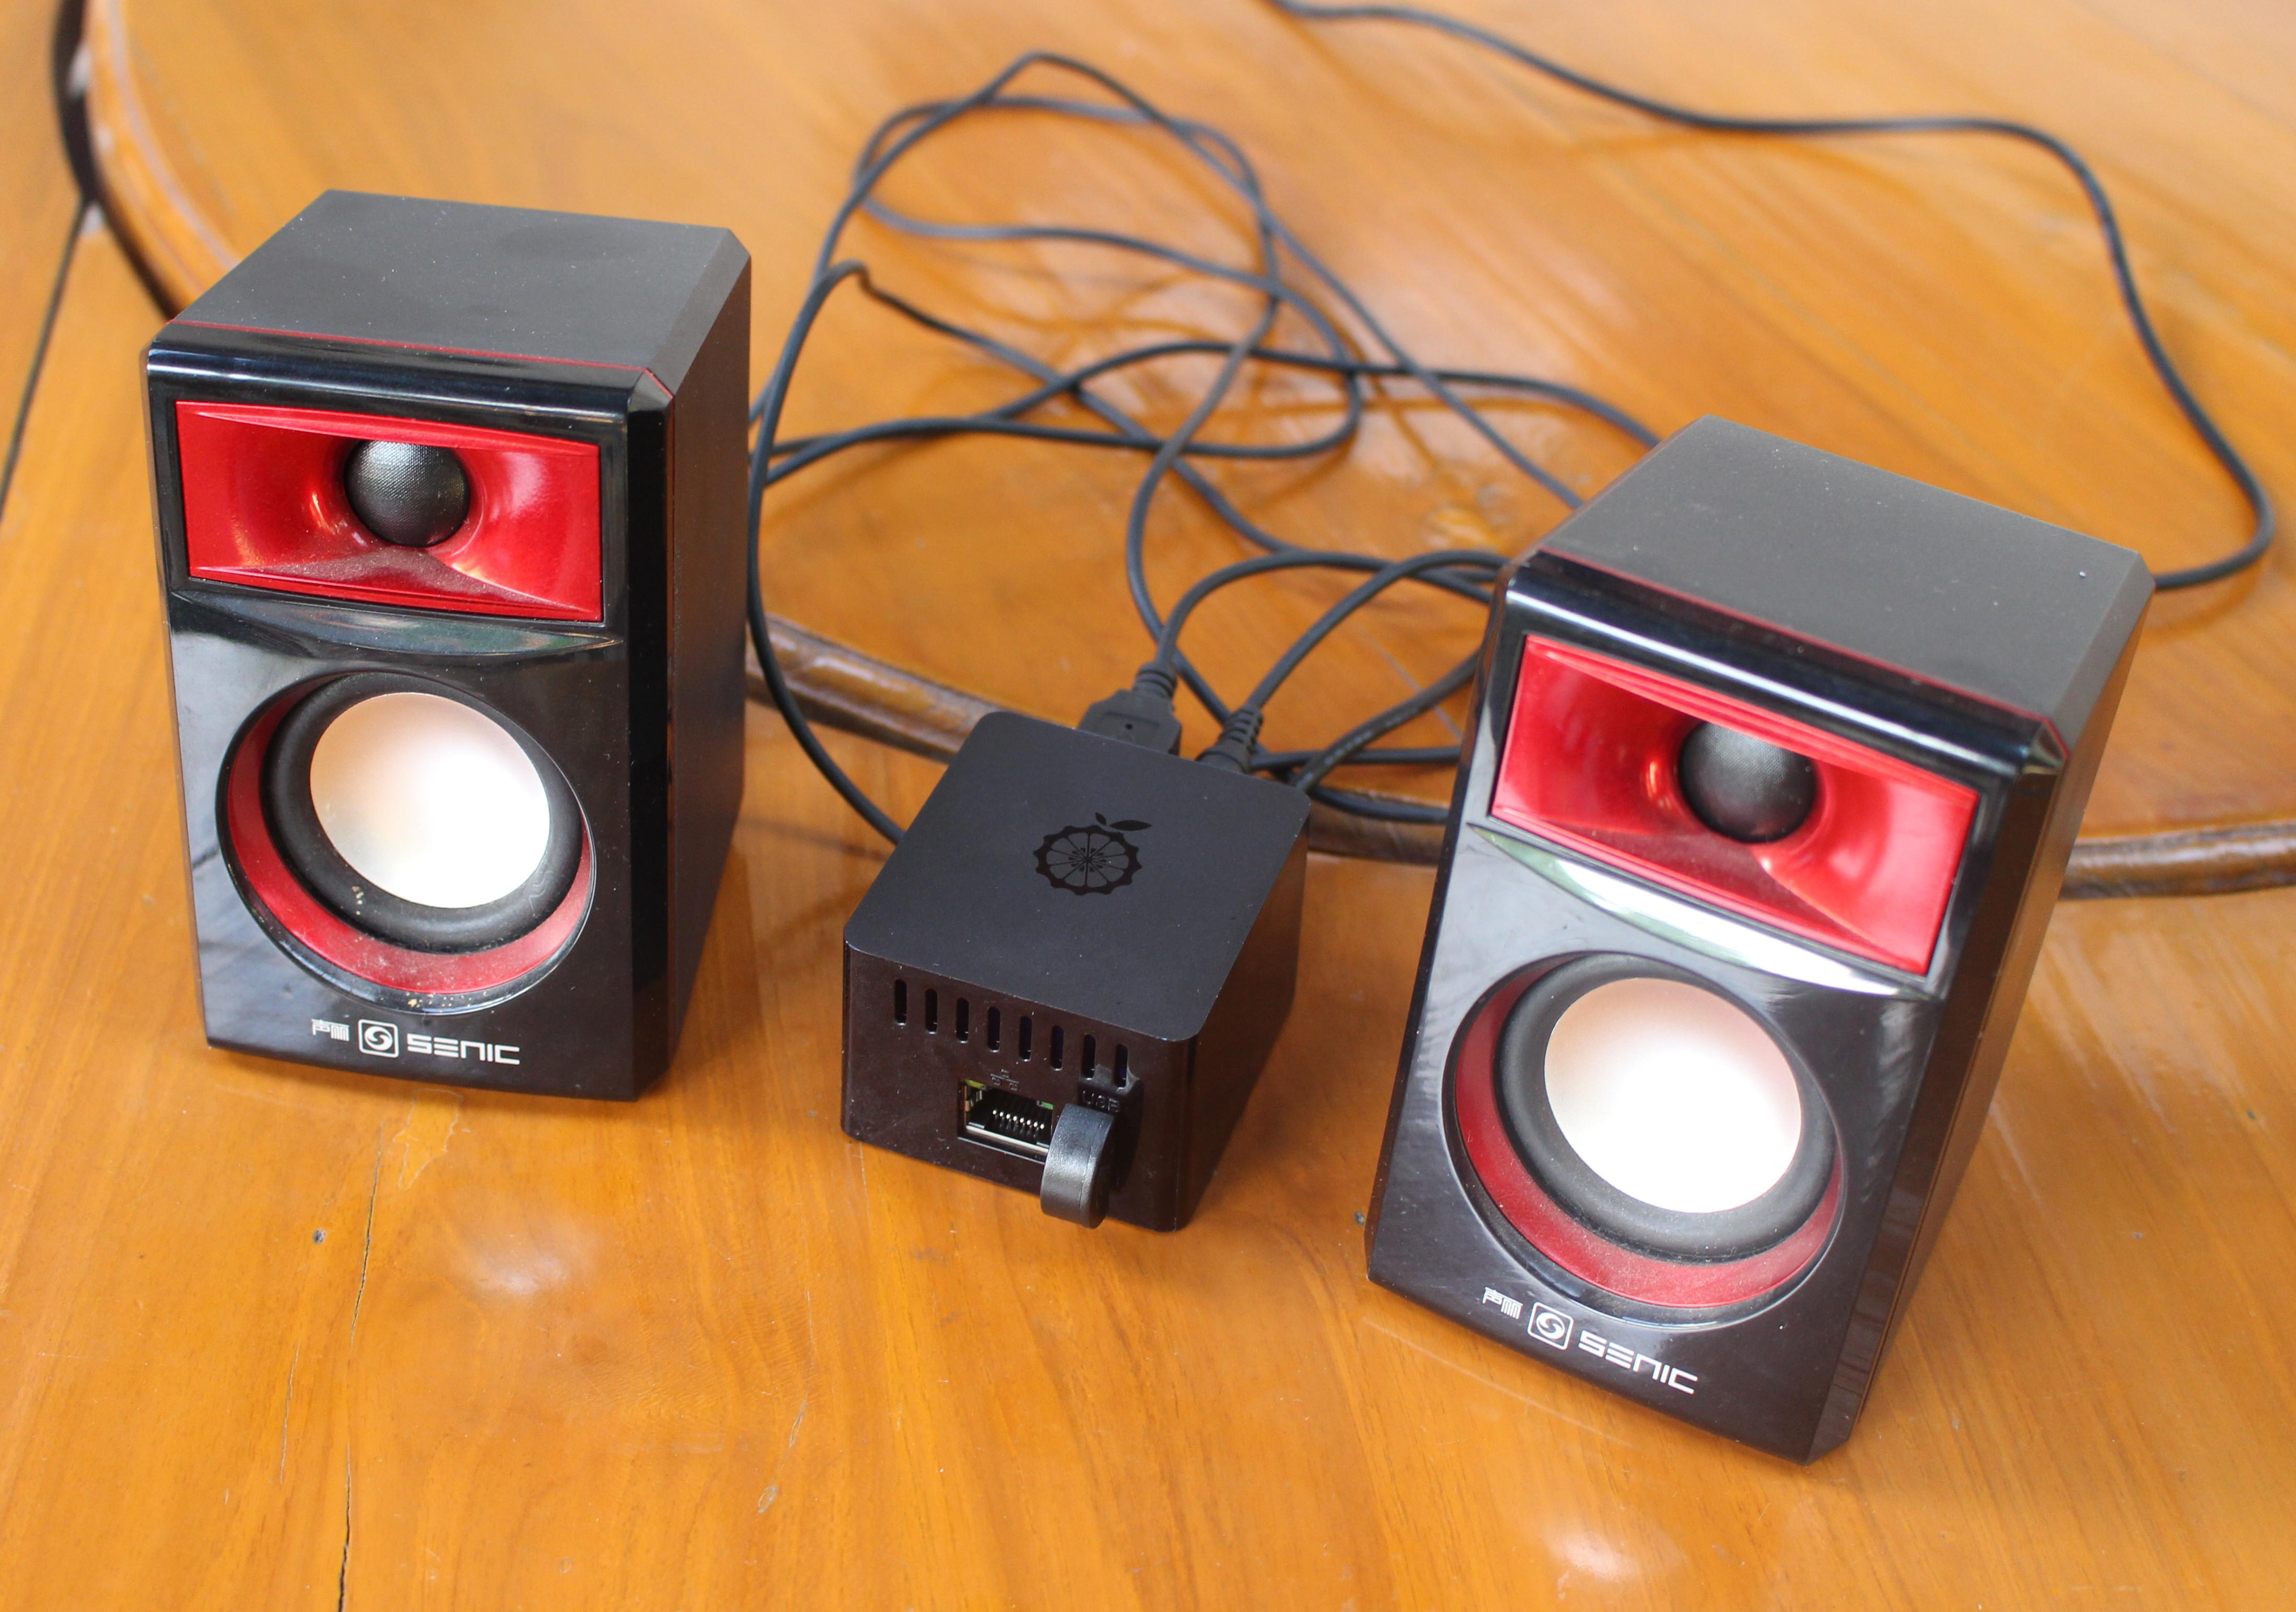 How to Setup an Orange Pi Zero DIY Smart Speaker with Google